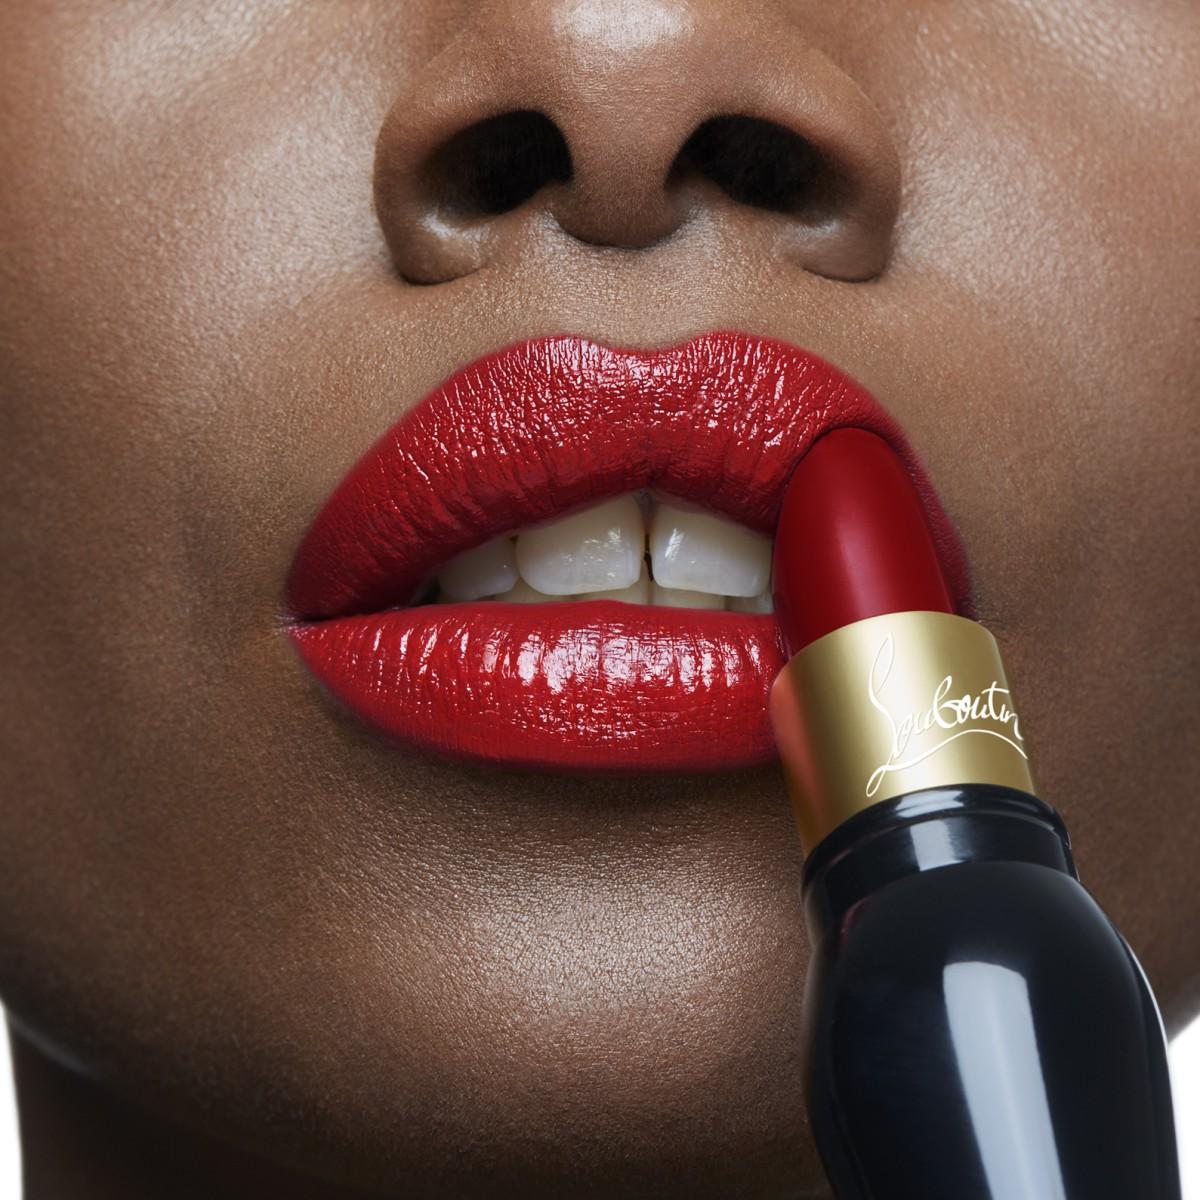 Beauty - Rouge Louboutin Silky Satin - Christian Louboutin